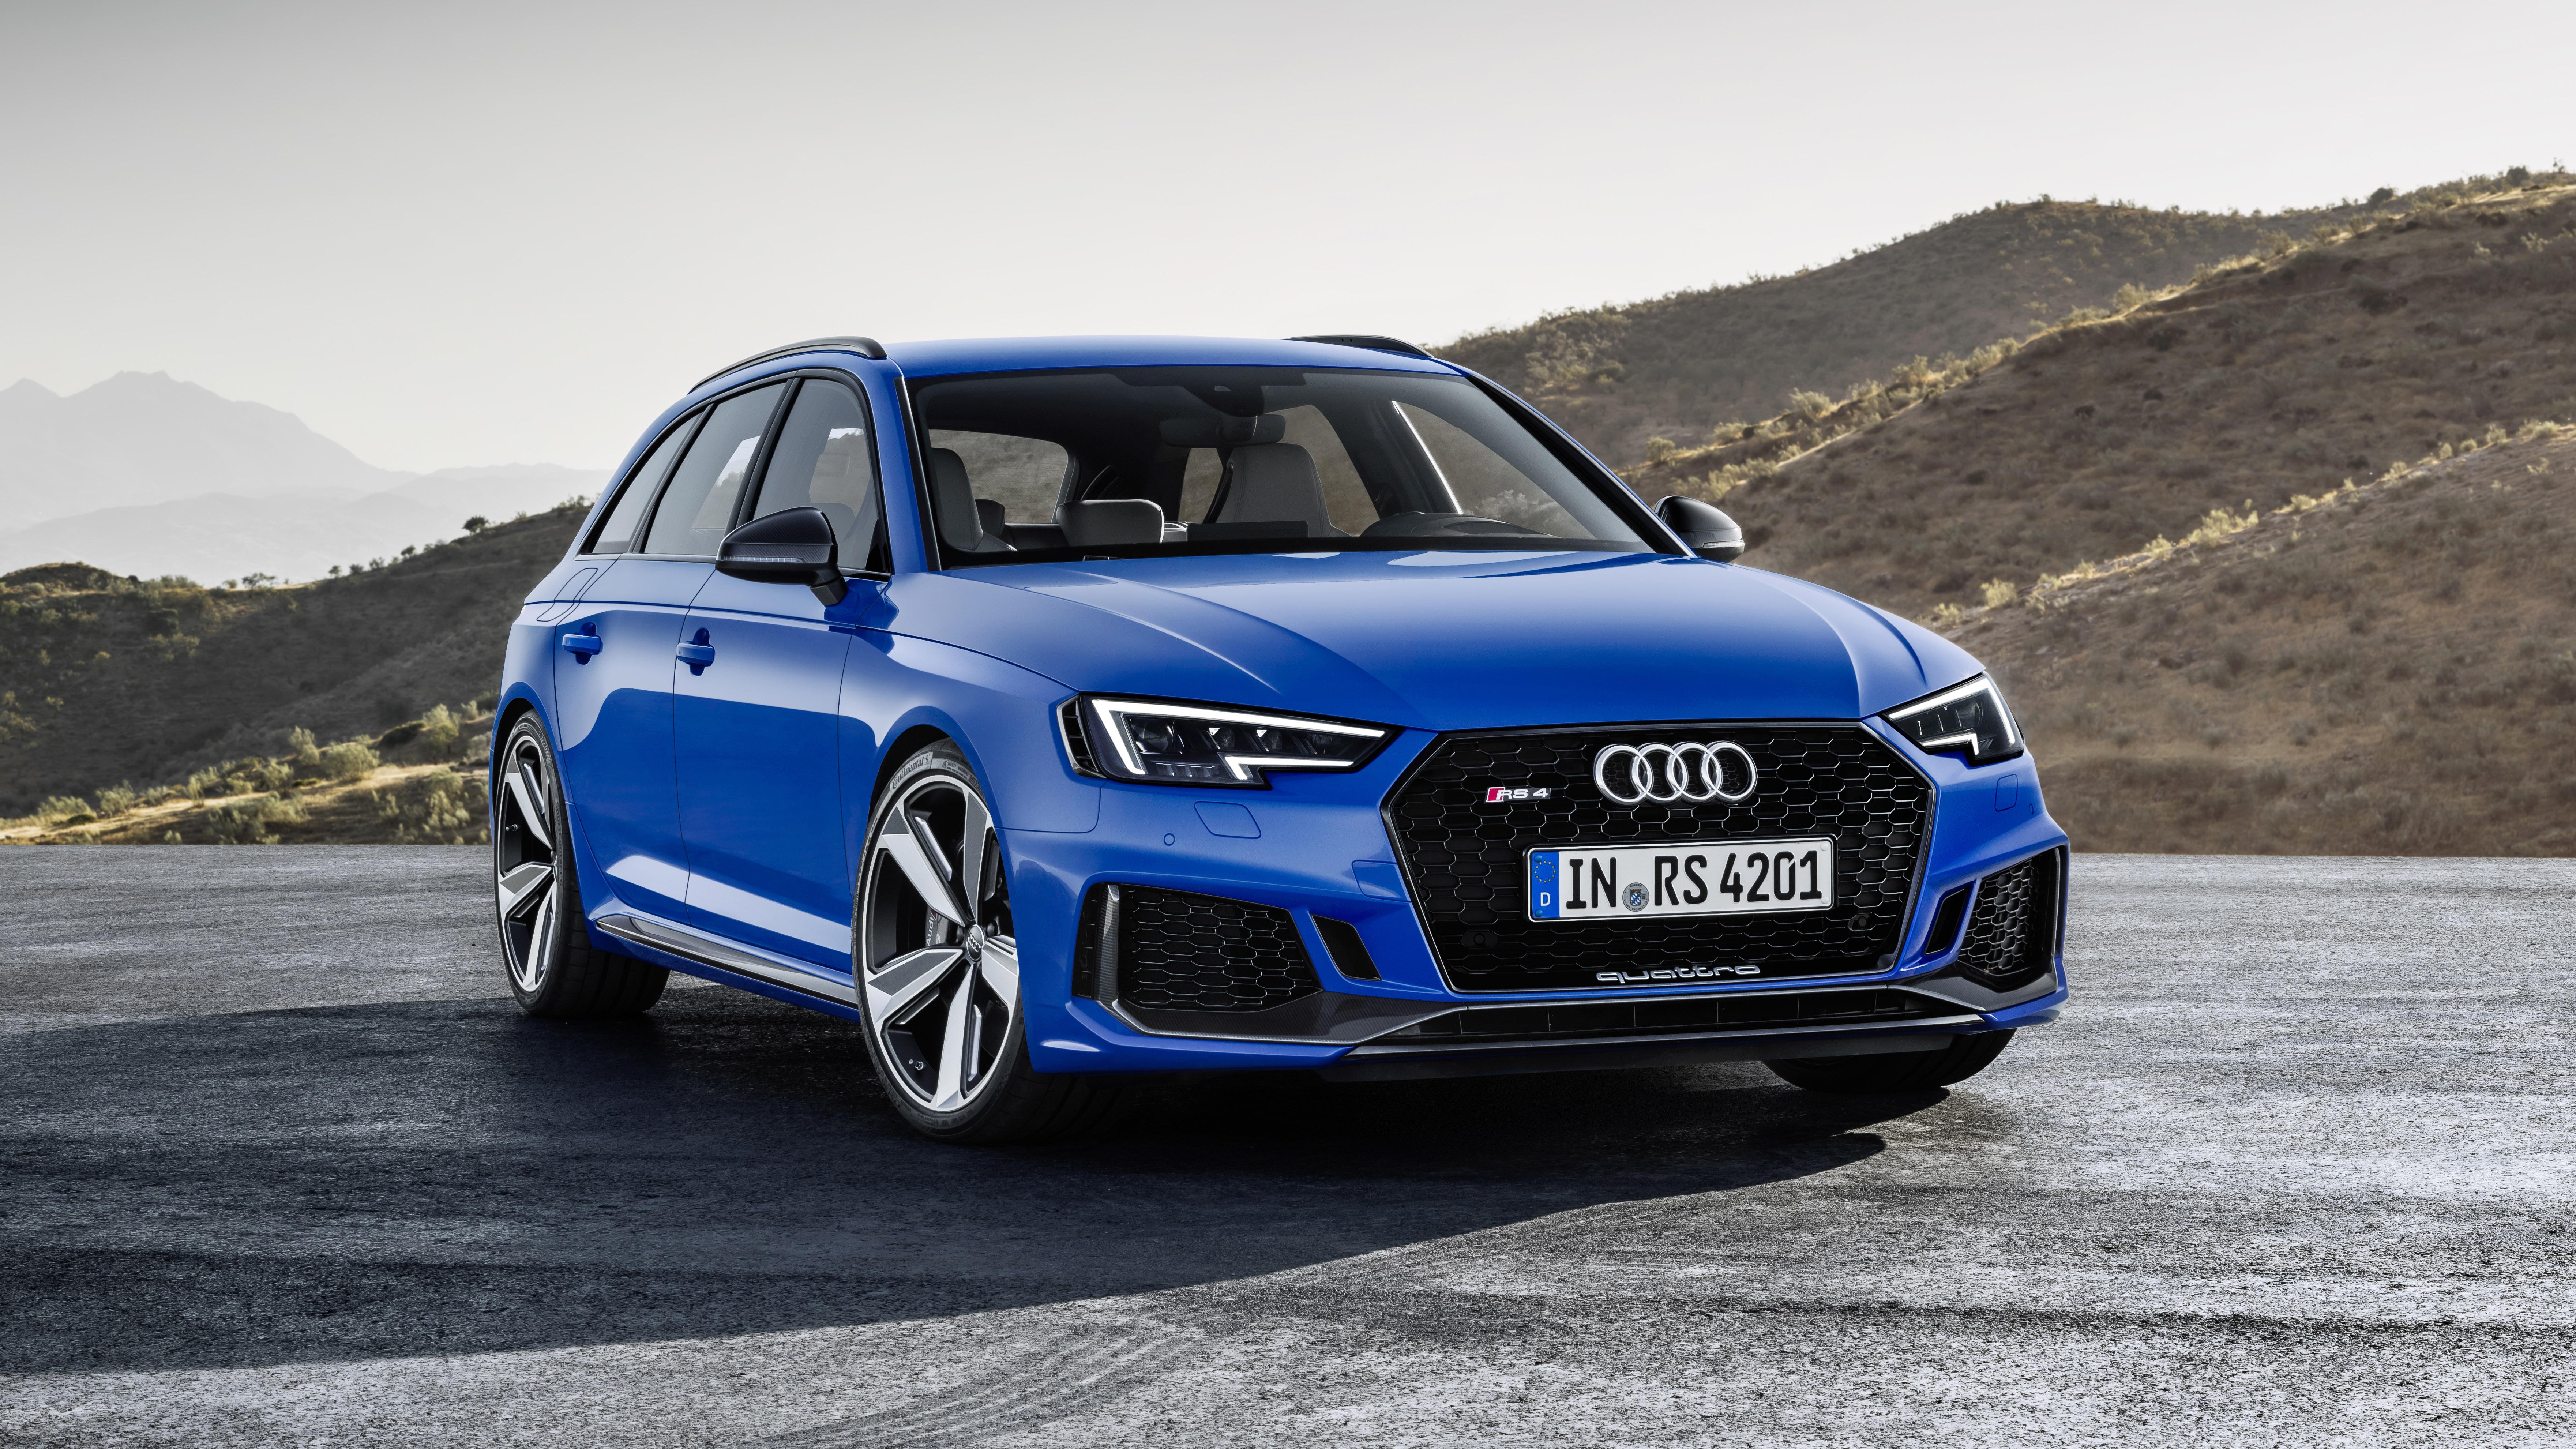 Audi RS4 front quarter